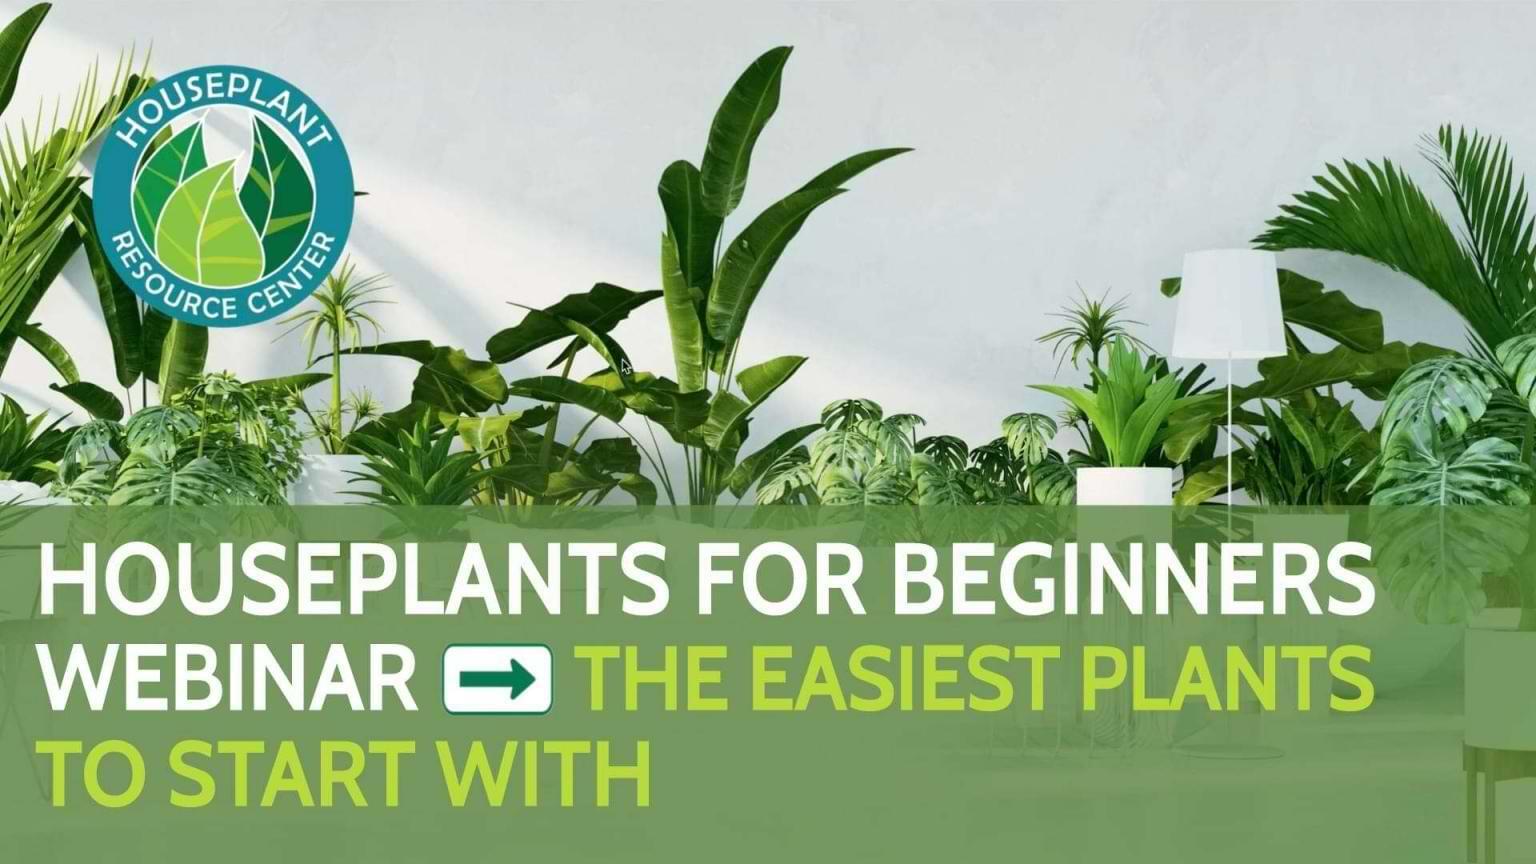 Houseplants For Beginners Webinar